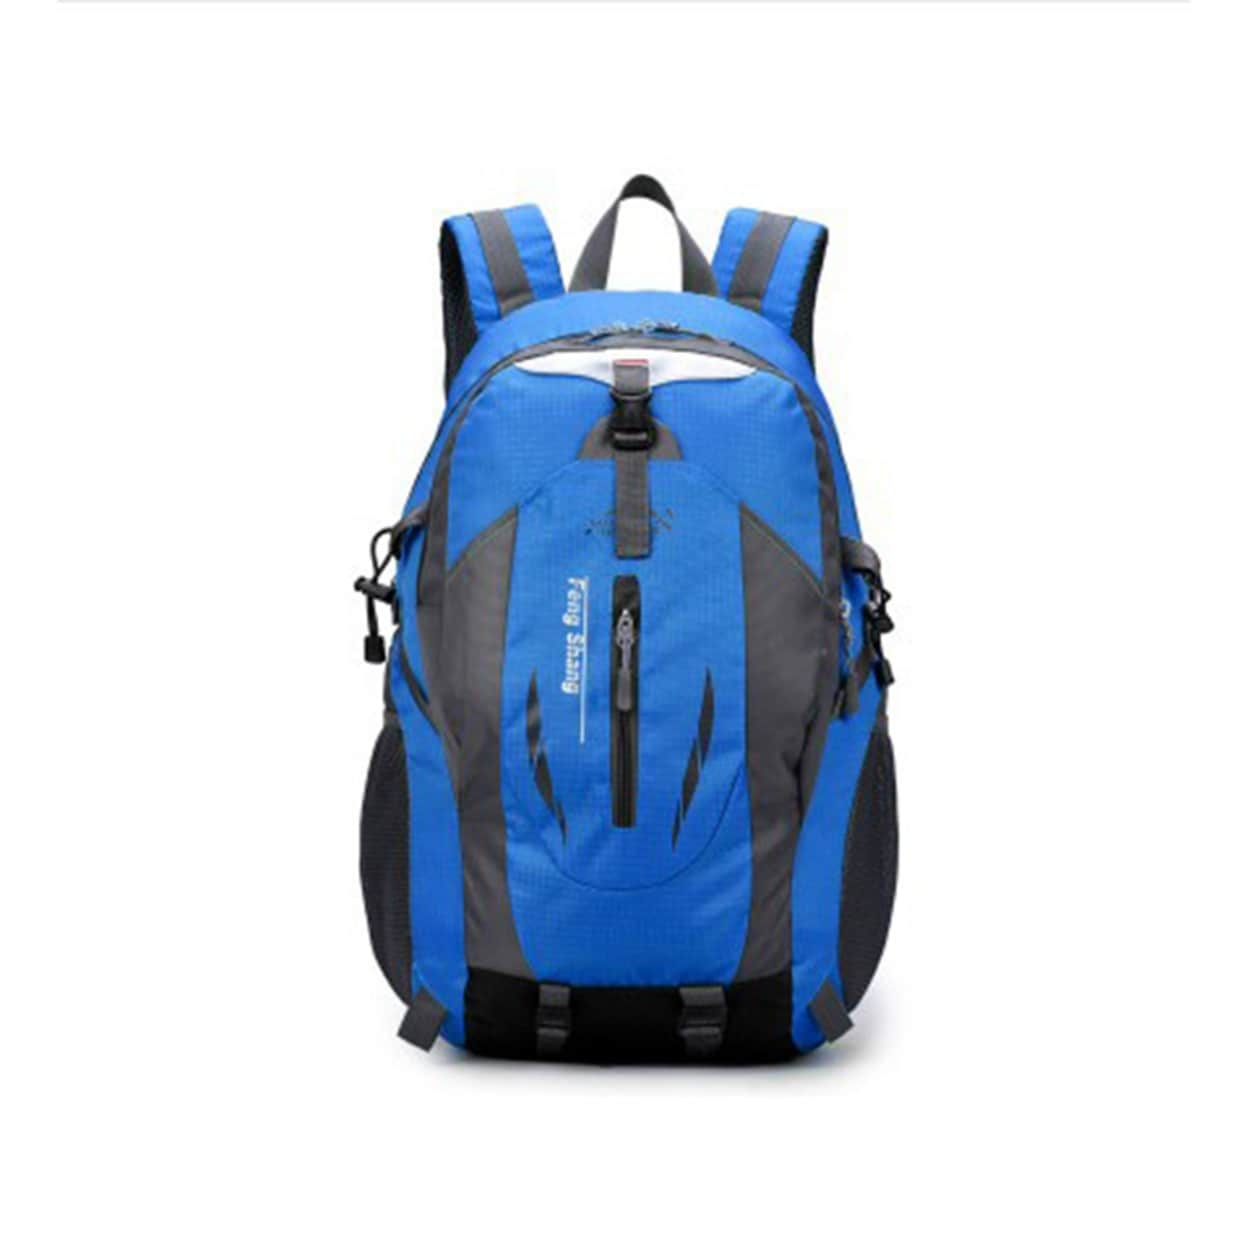 34f8818a104d Fashion Lightweight Waterproof Outdoor Shoulder Bag Hiking Climbing Backpack